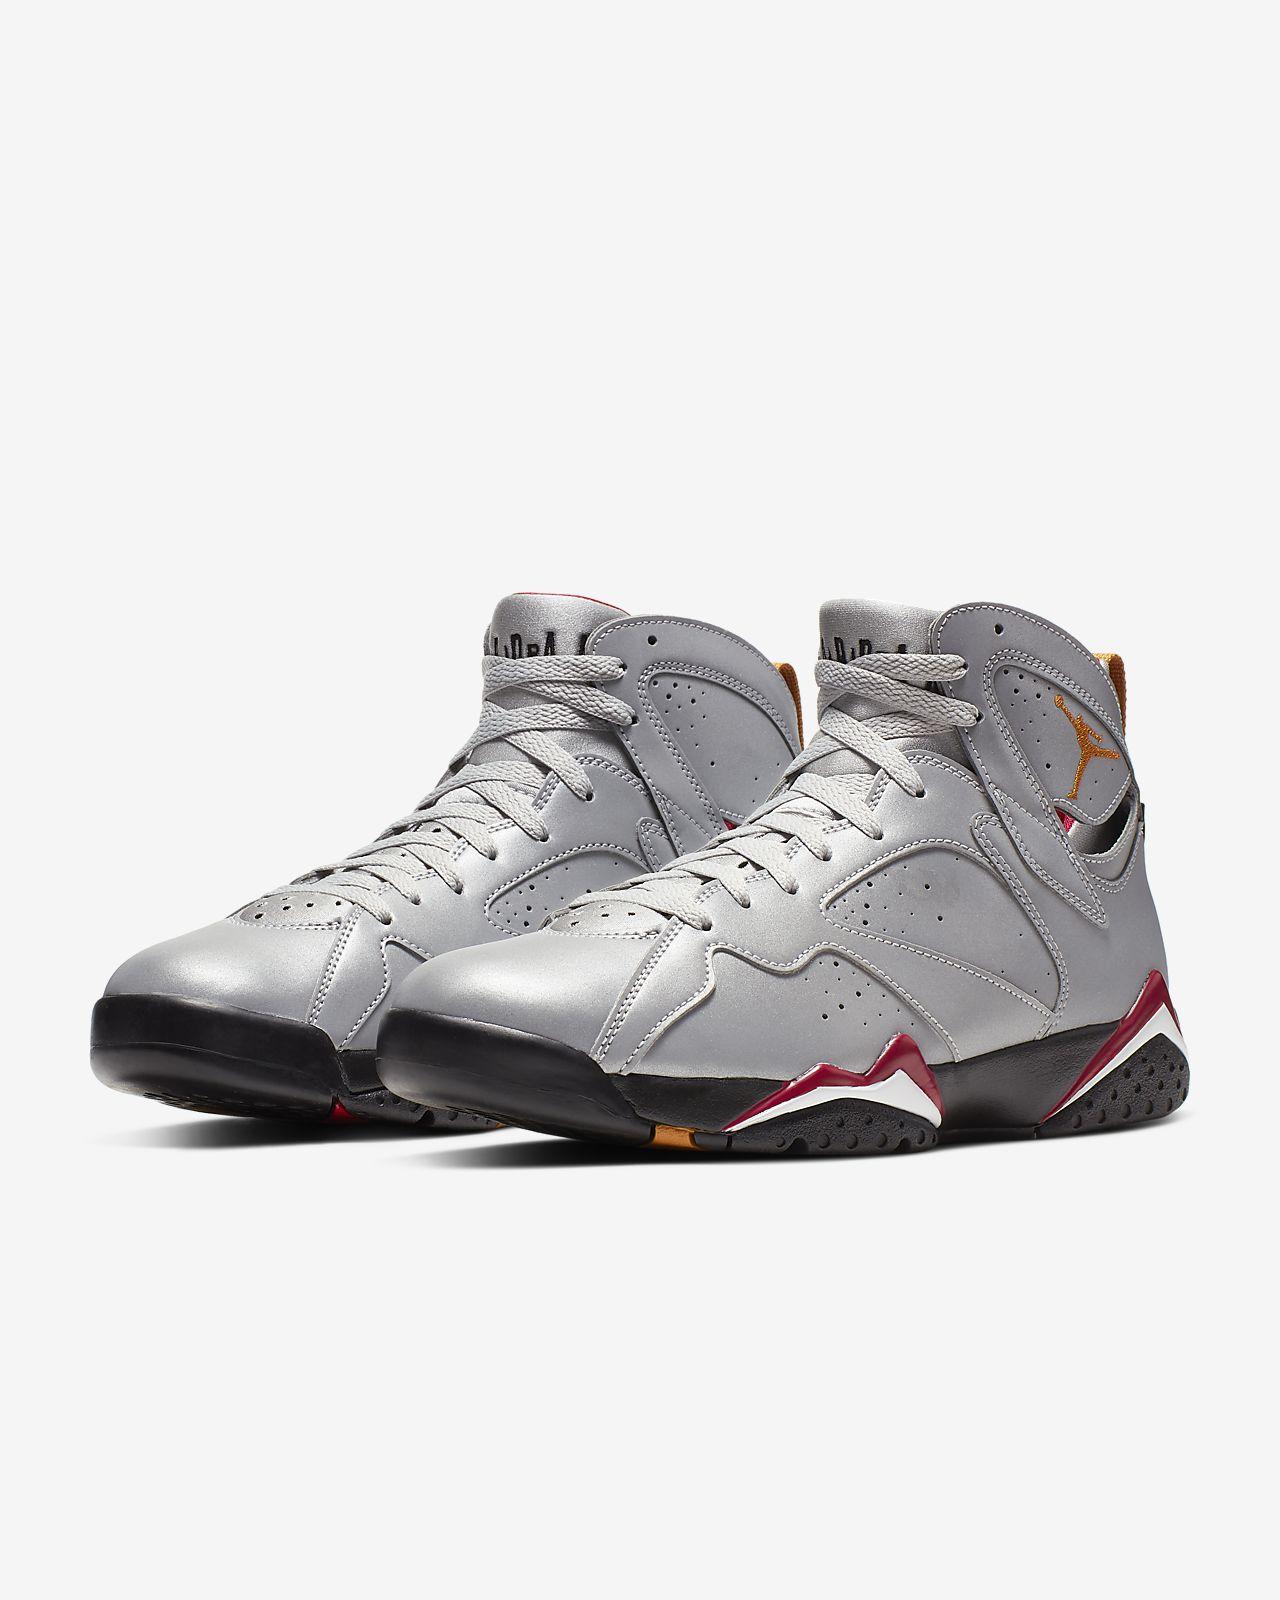 best service 9ffce 18463 Air Jordan 7 Retro SP Men's Shoe